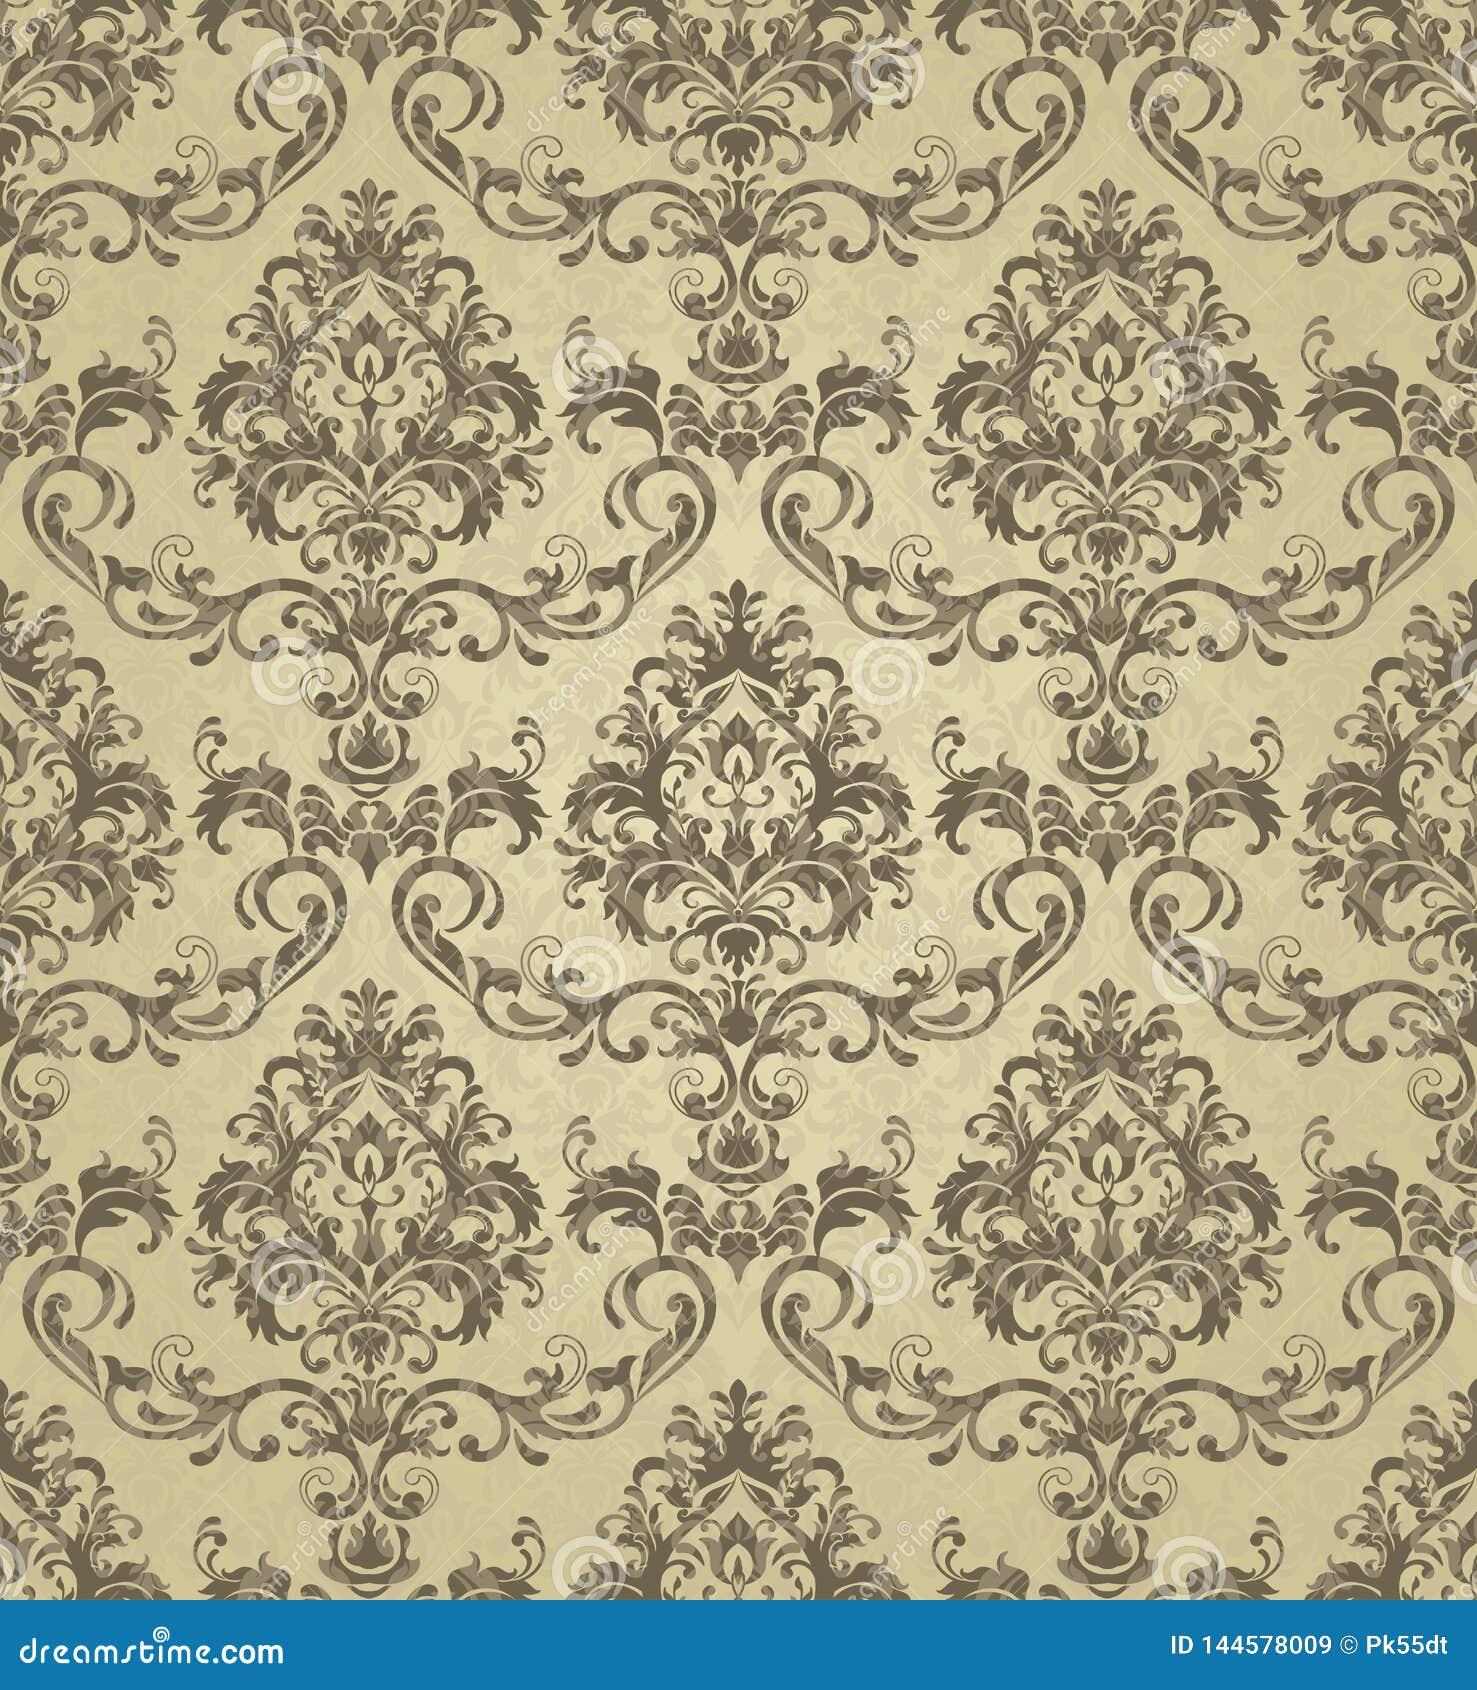 Seamless Gold Damask Design For Decor Textile Fabric